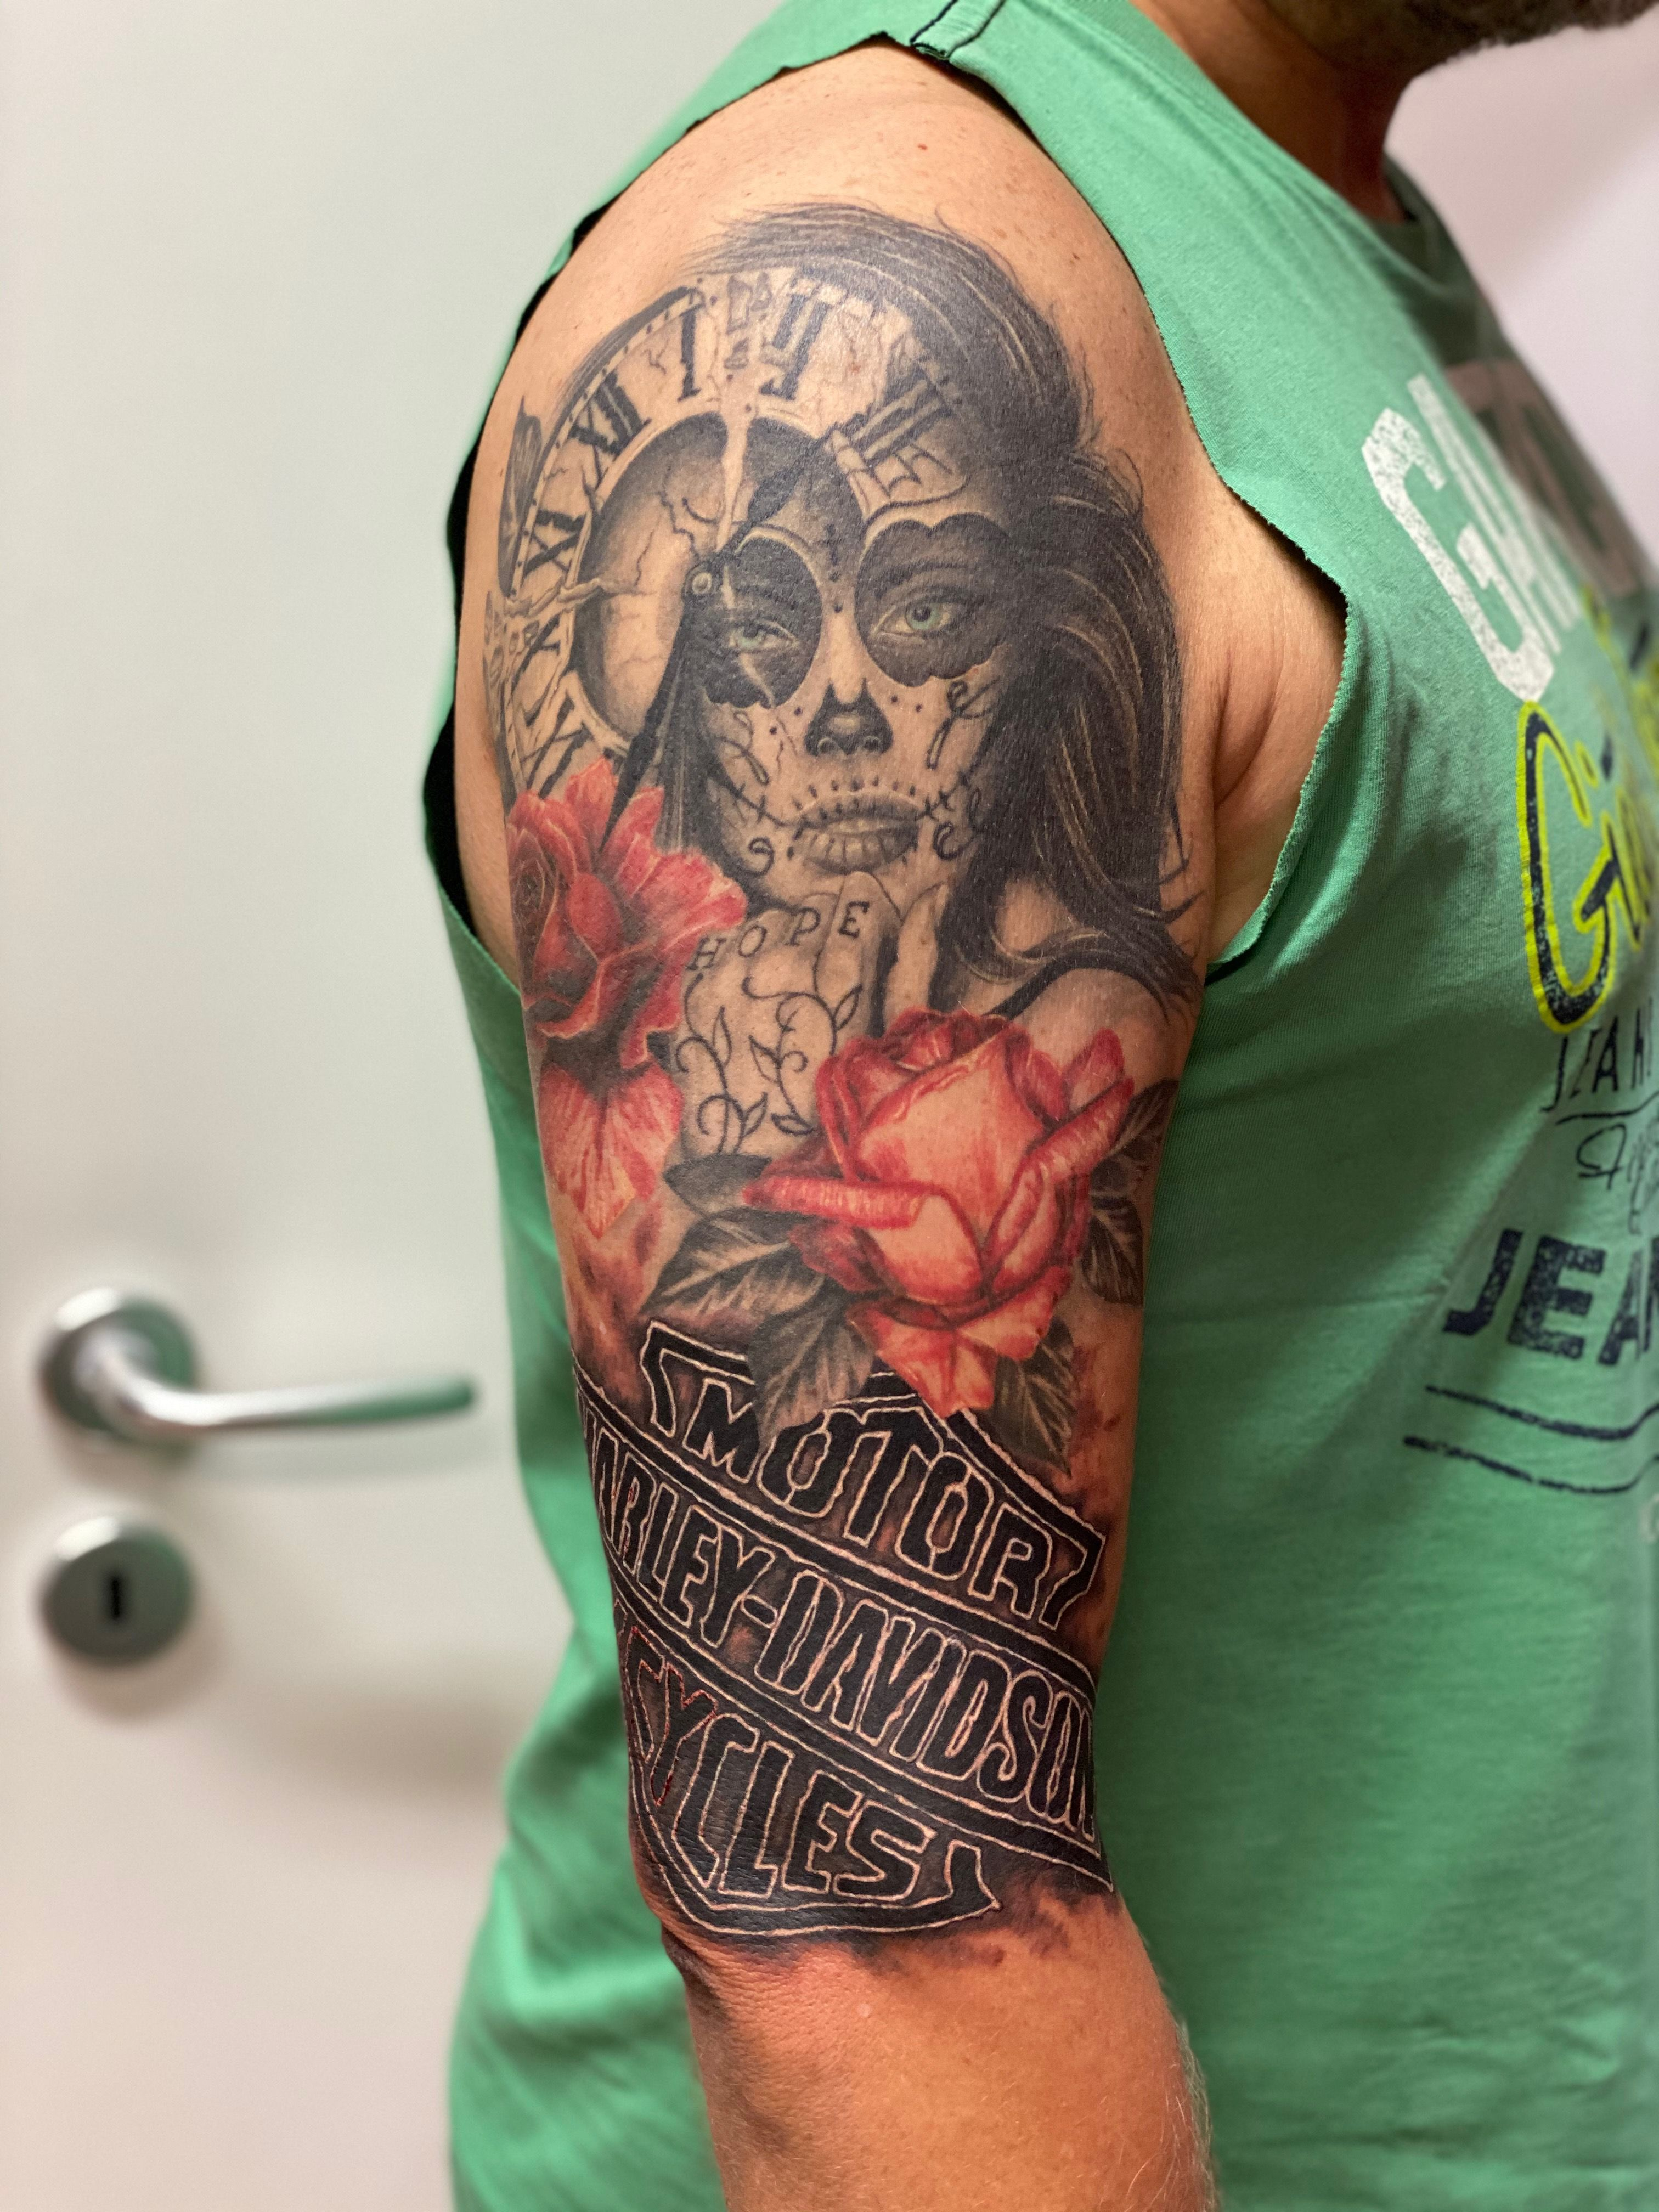 #forlifecolor #tattoo #tattooideas #tattoos #tattoorosenheim #tattoogirls #tattoomen #ink #inked #inkedmen #inkedgirl #inkmagazine #inkmaster #tattooer #tattooist #tattoorealistic #tatts #inkedgirls #inktattoo #black #blackandgreyink #blackandgrey #inks #inktattoo #colortattoos #harleydavidson #sleevetattoos #harley